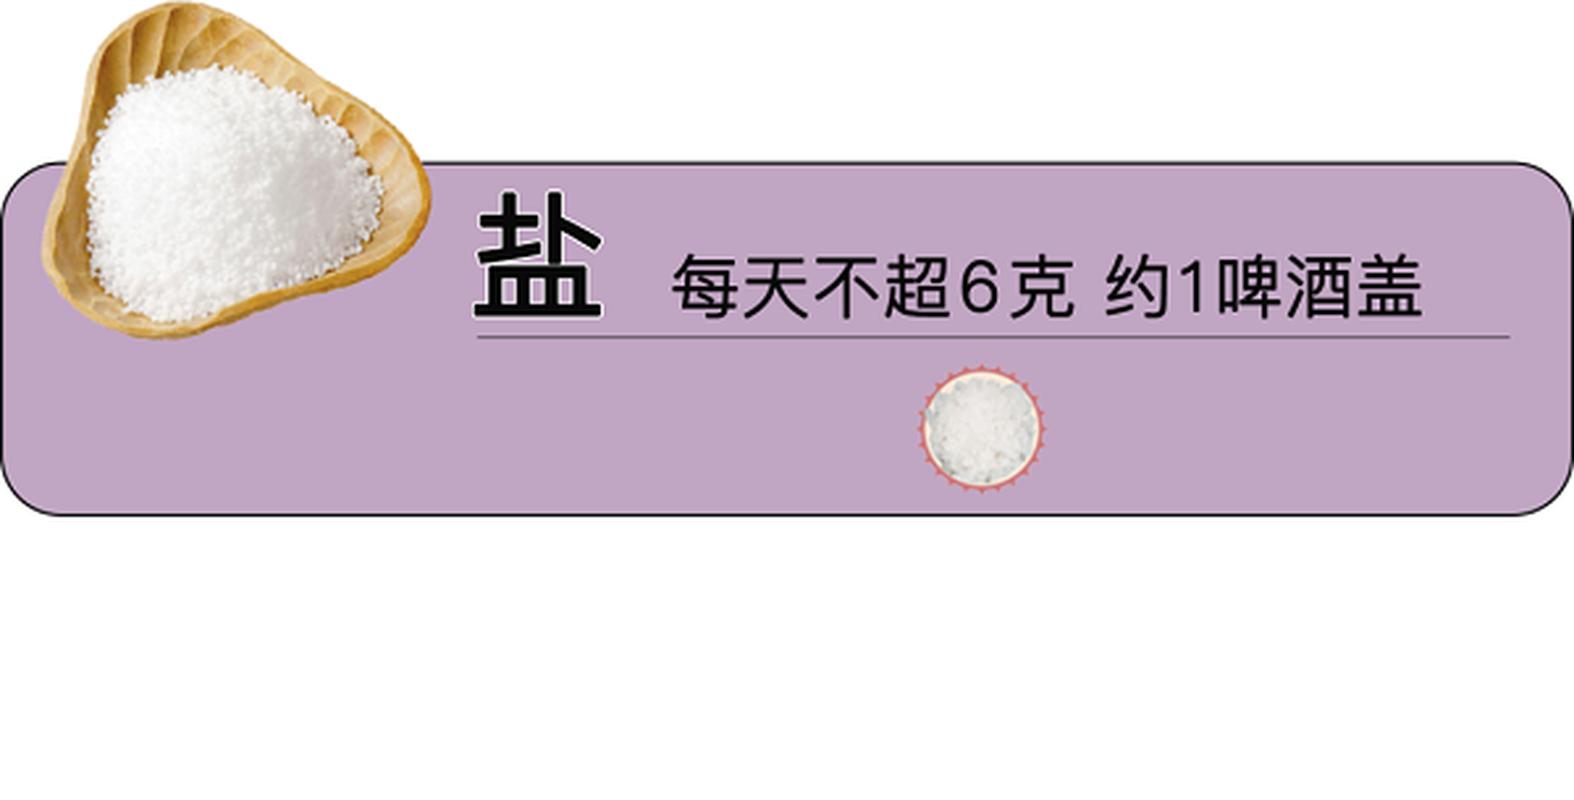 Sai lam khi an khien gan nhiem mo, hai suc khoe-Hinh-7